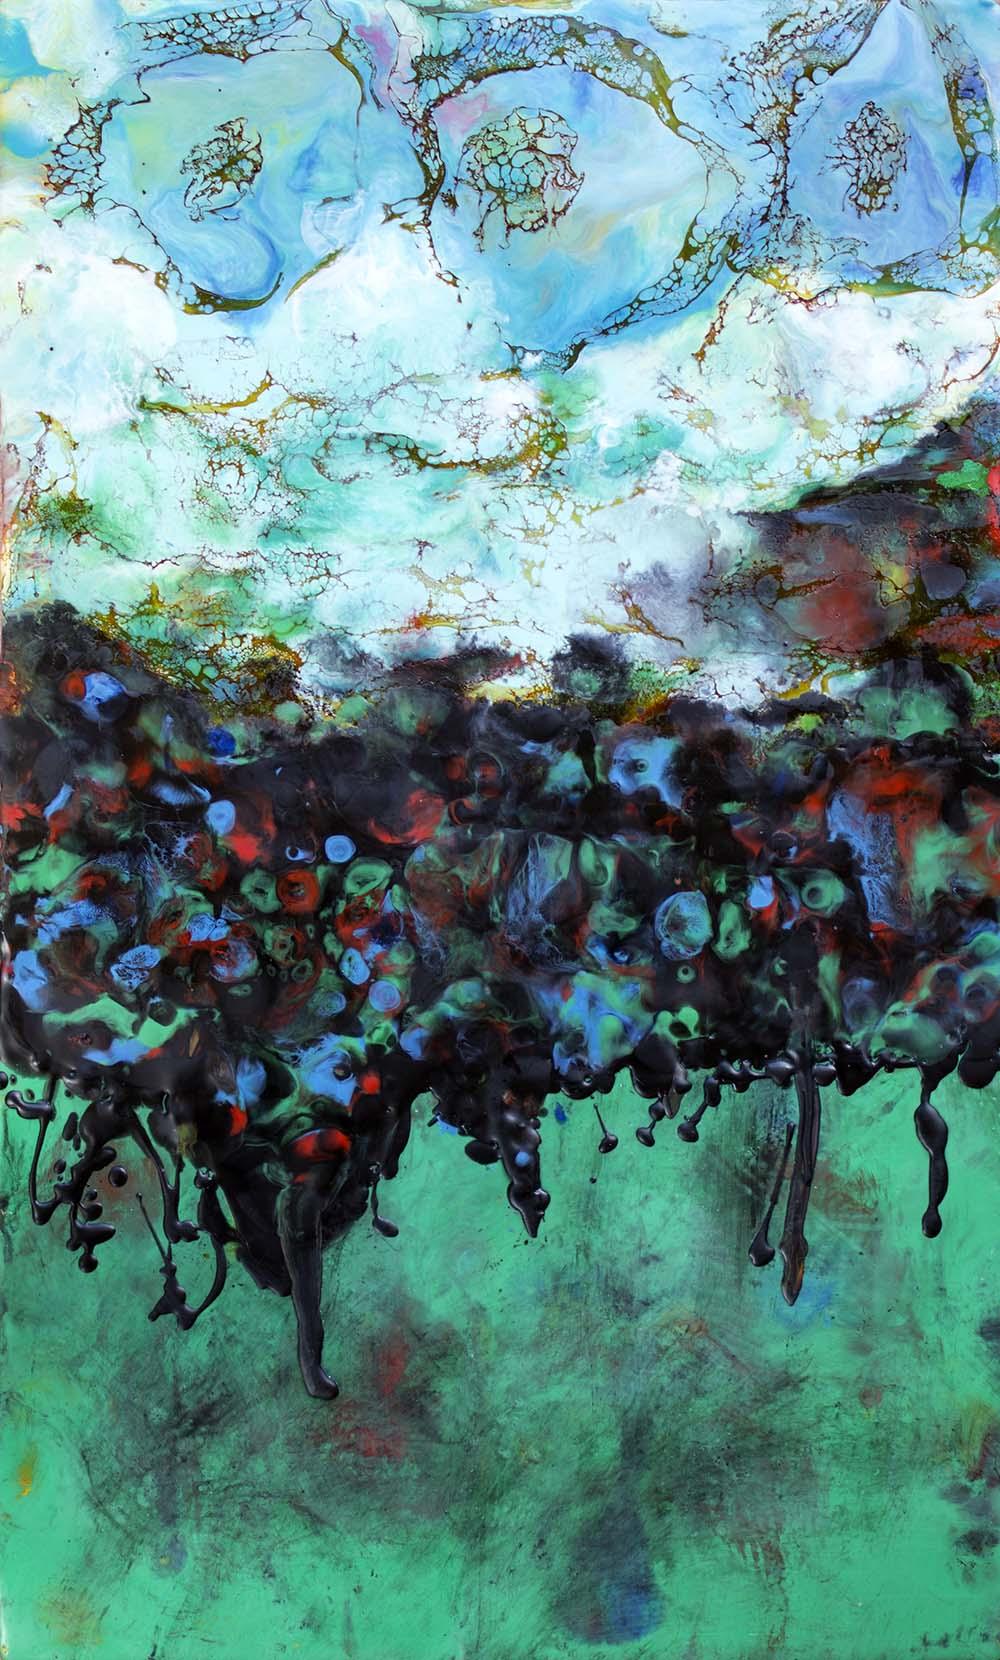 weebly-floating-kelp-beds-img_4768